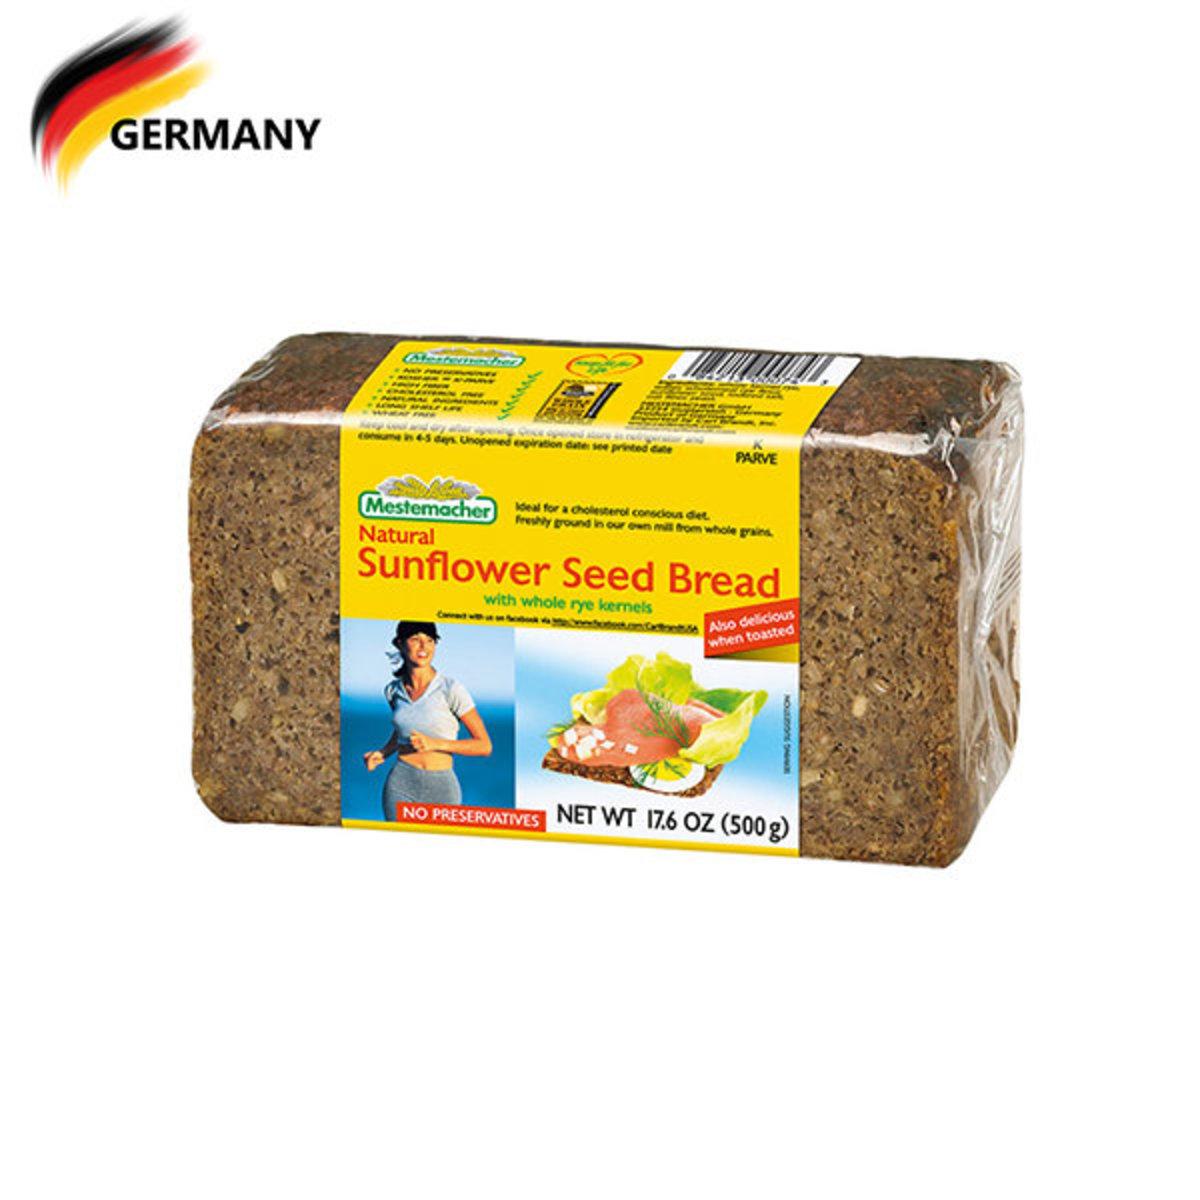 Sunflower Seed Bread 500G (best before date: 15/01/2020)